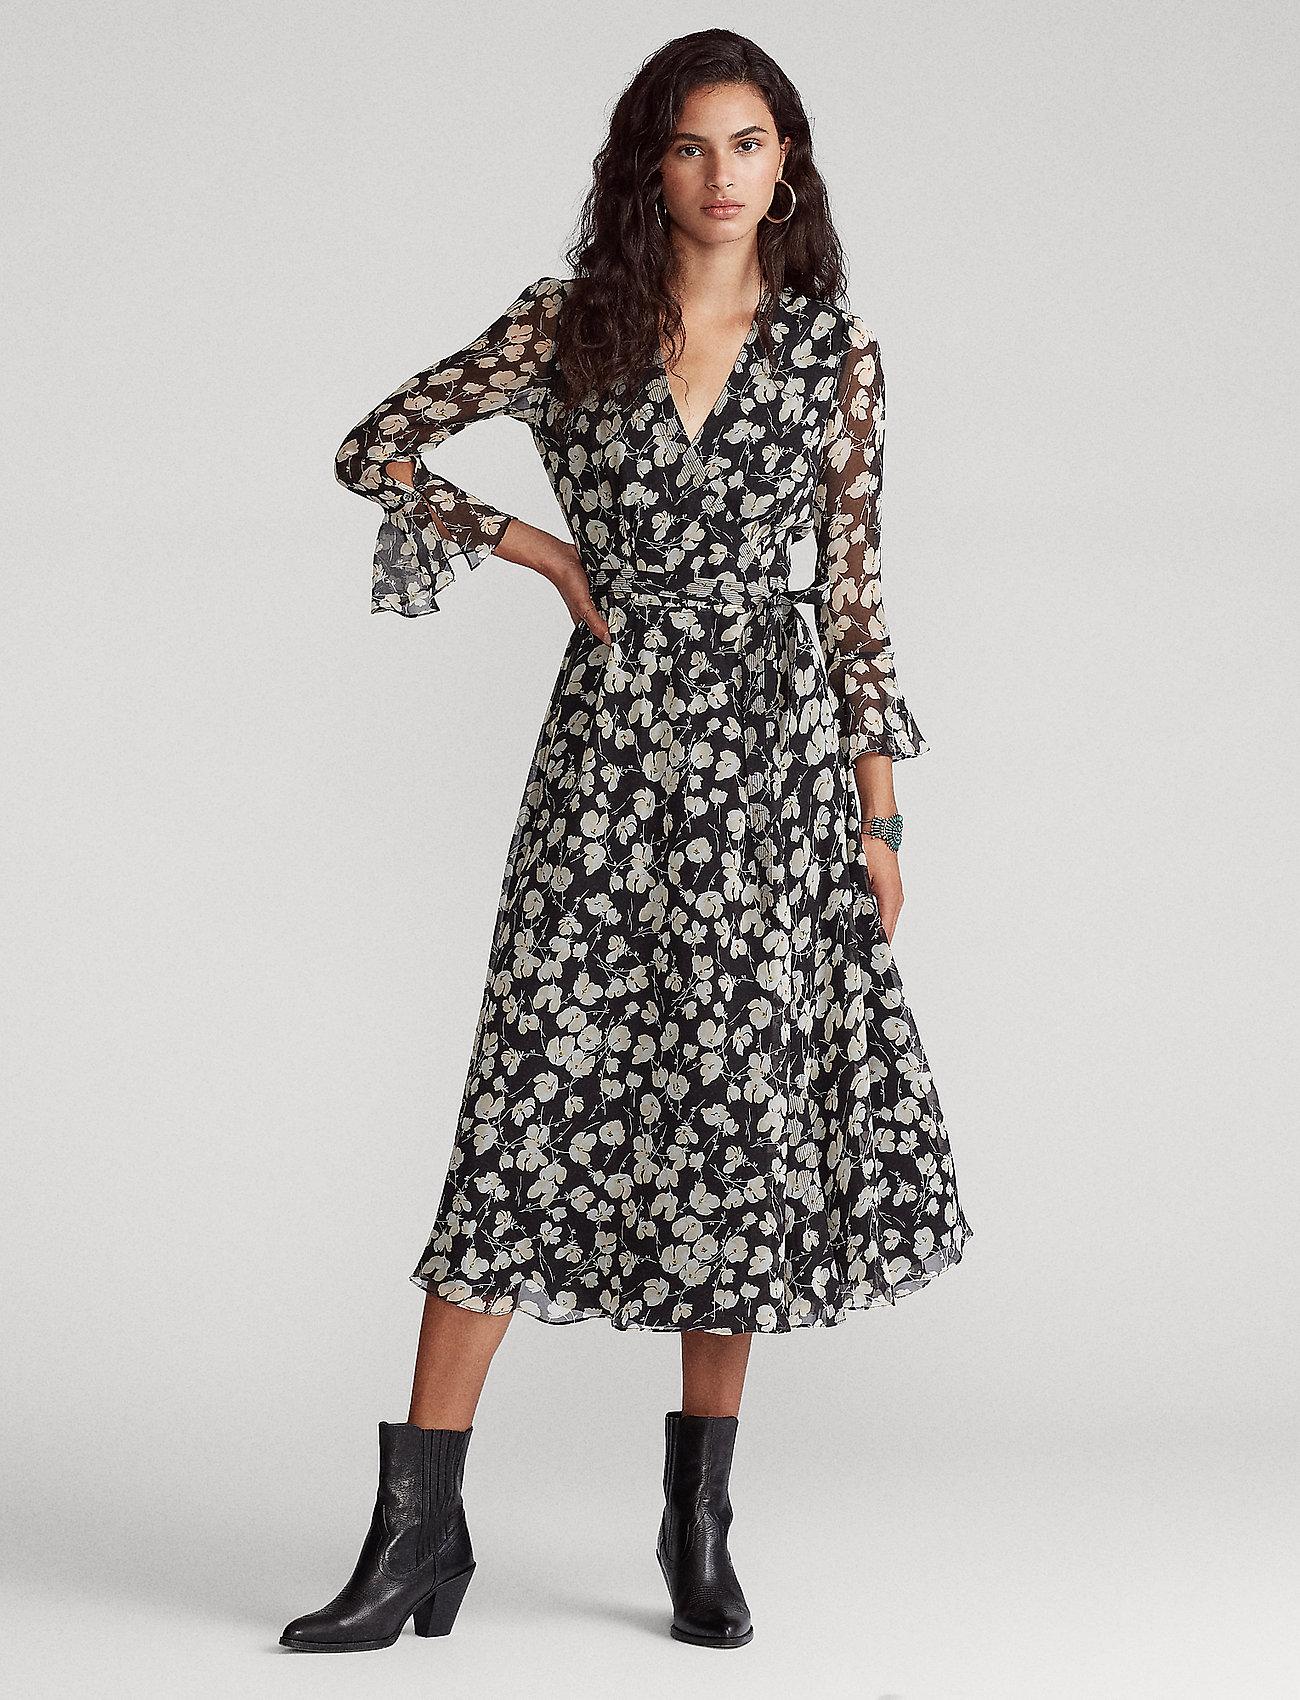 Polo Ralph Lauren - Floral Wrap Dress - everyday dresses - 766 black/white i - 0